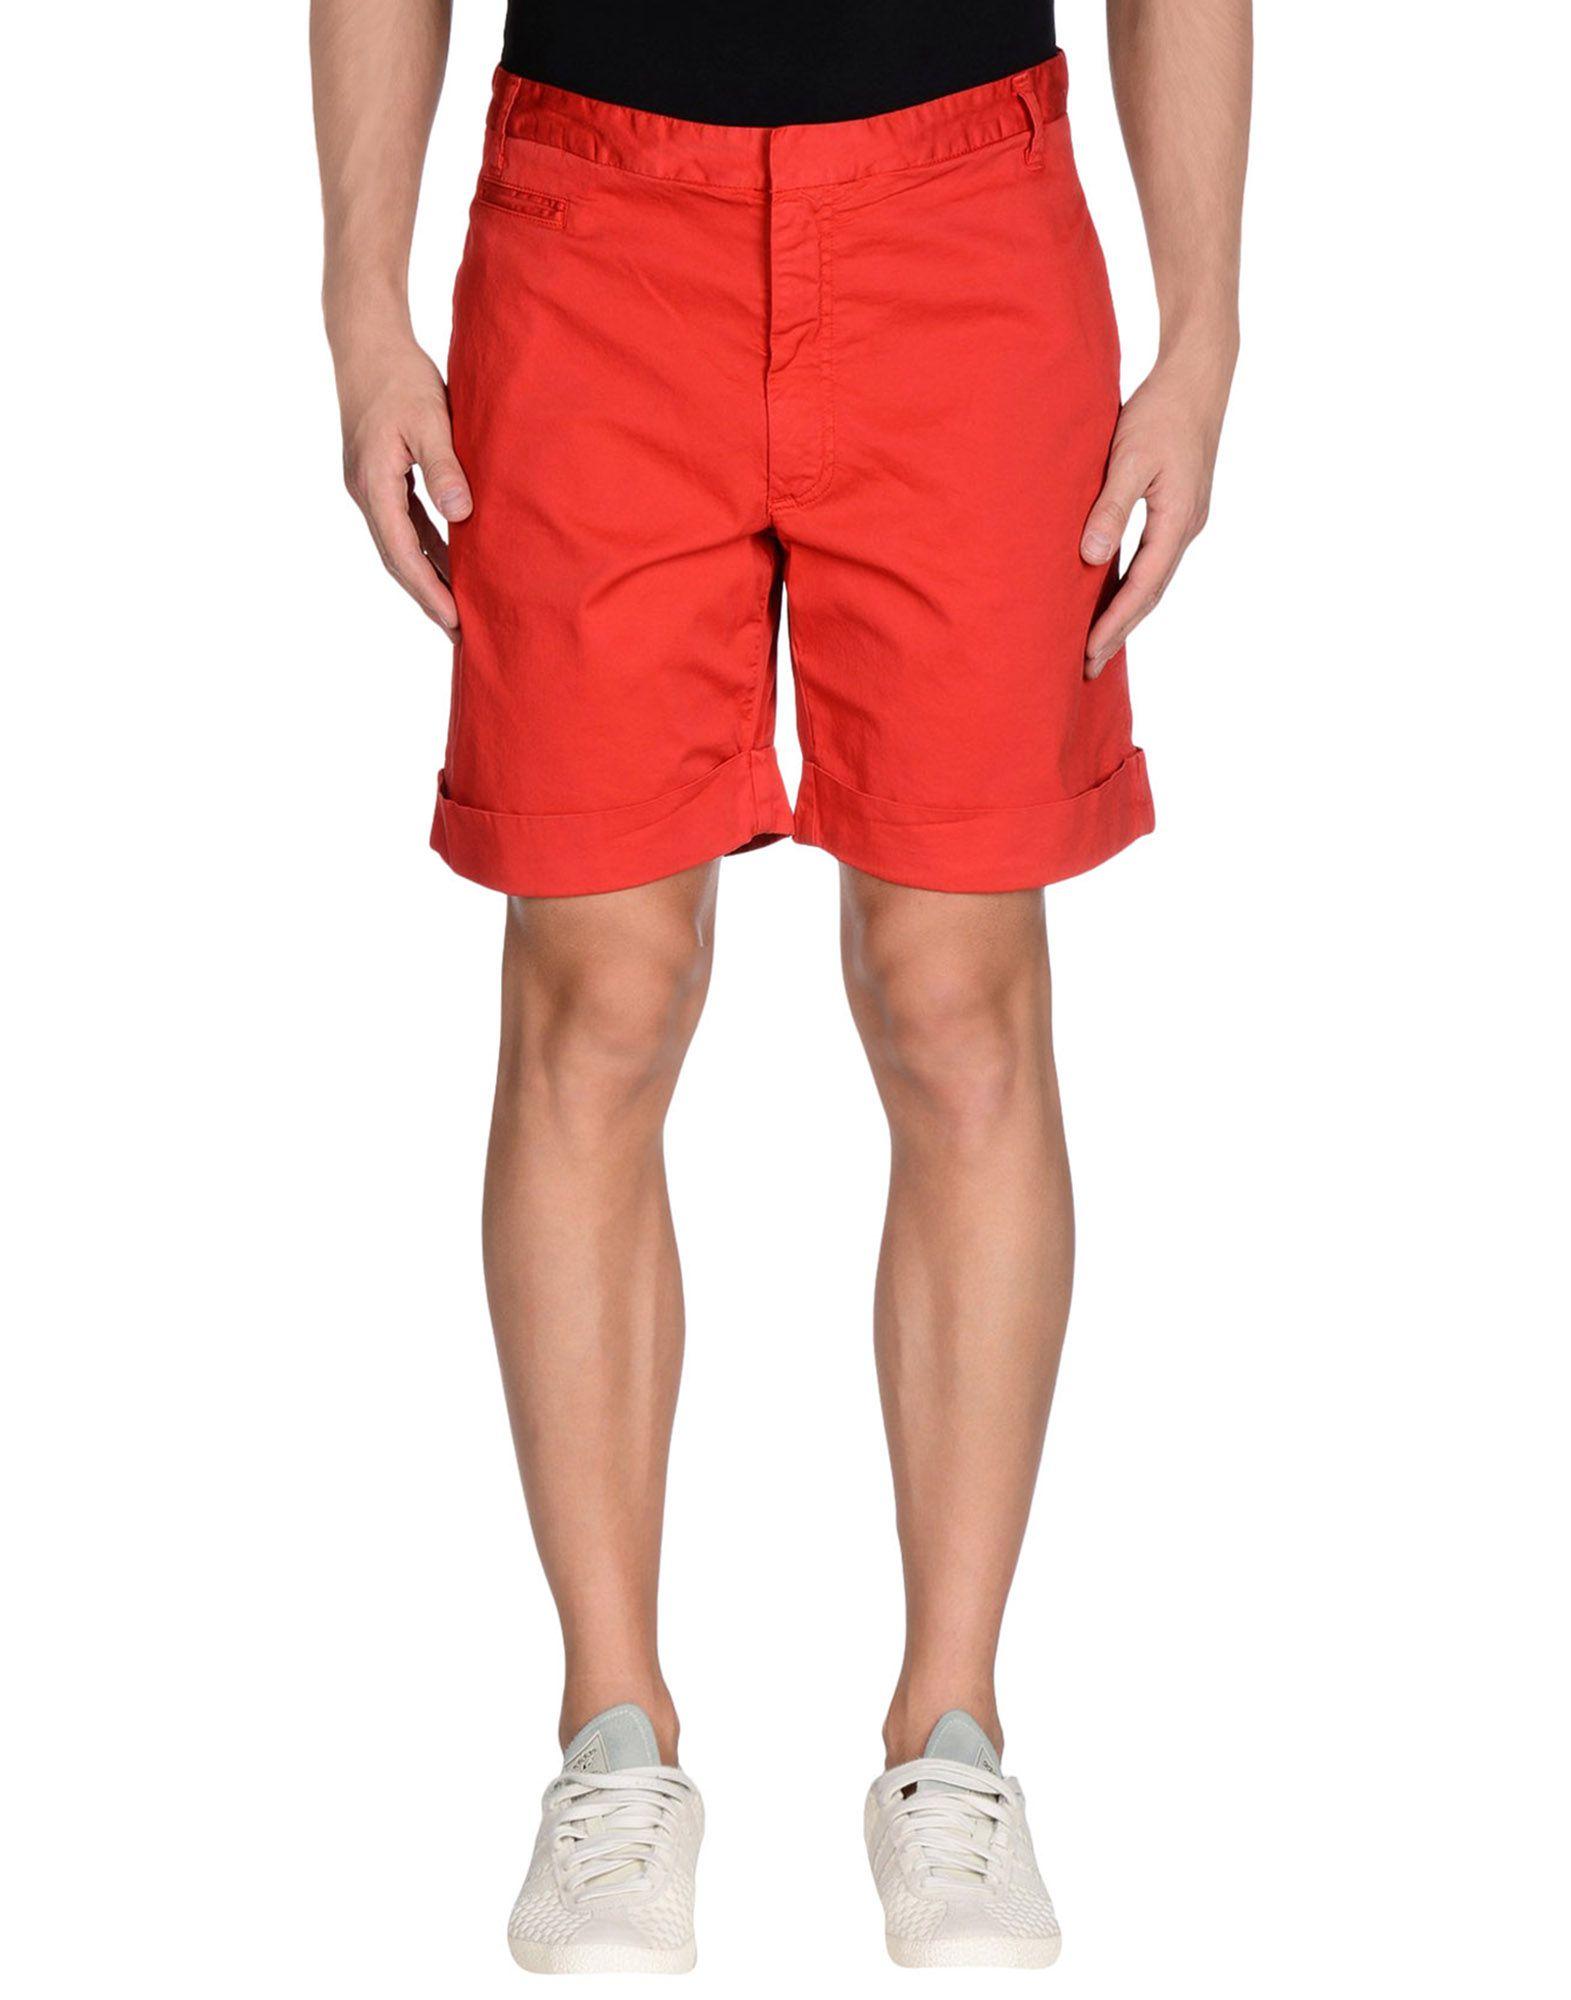 FRED PERRY Herren Bermudashorts Farbe Rot Größe 6